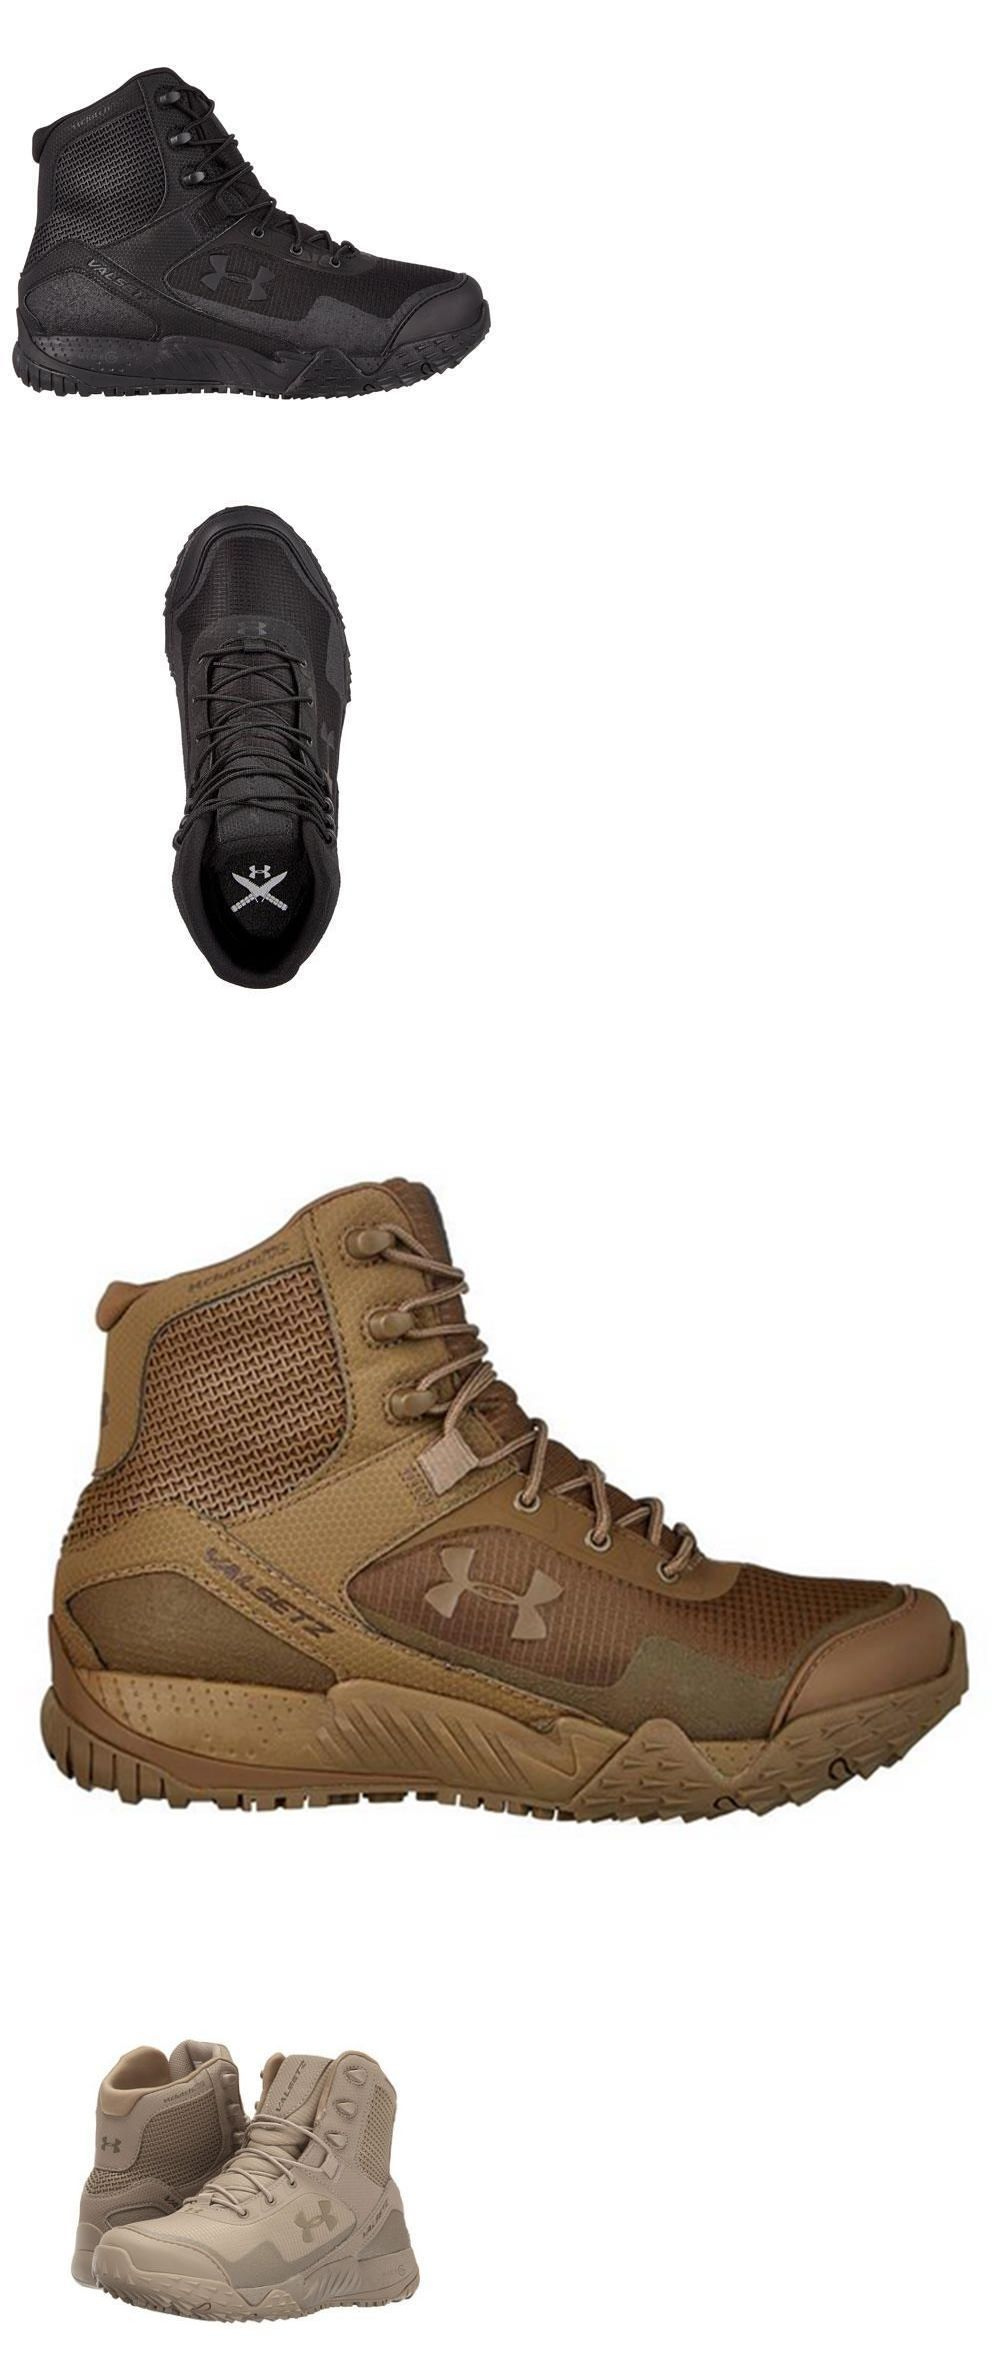 044c35982d8 Tactical Footwear 177897: Under Armour 1250592 Women S Ua Valsetz ...